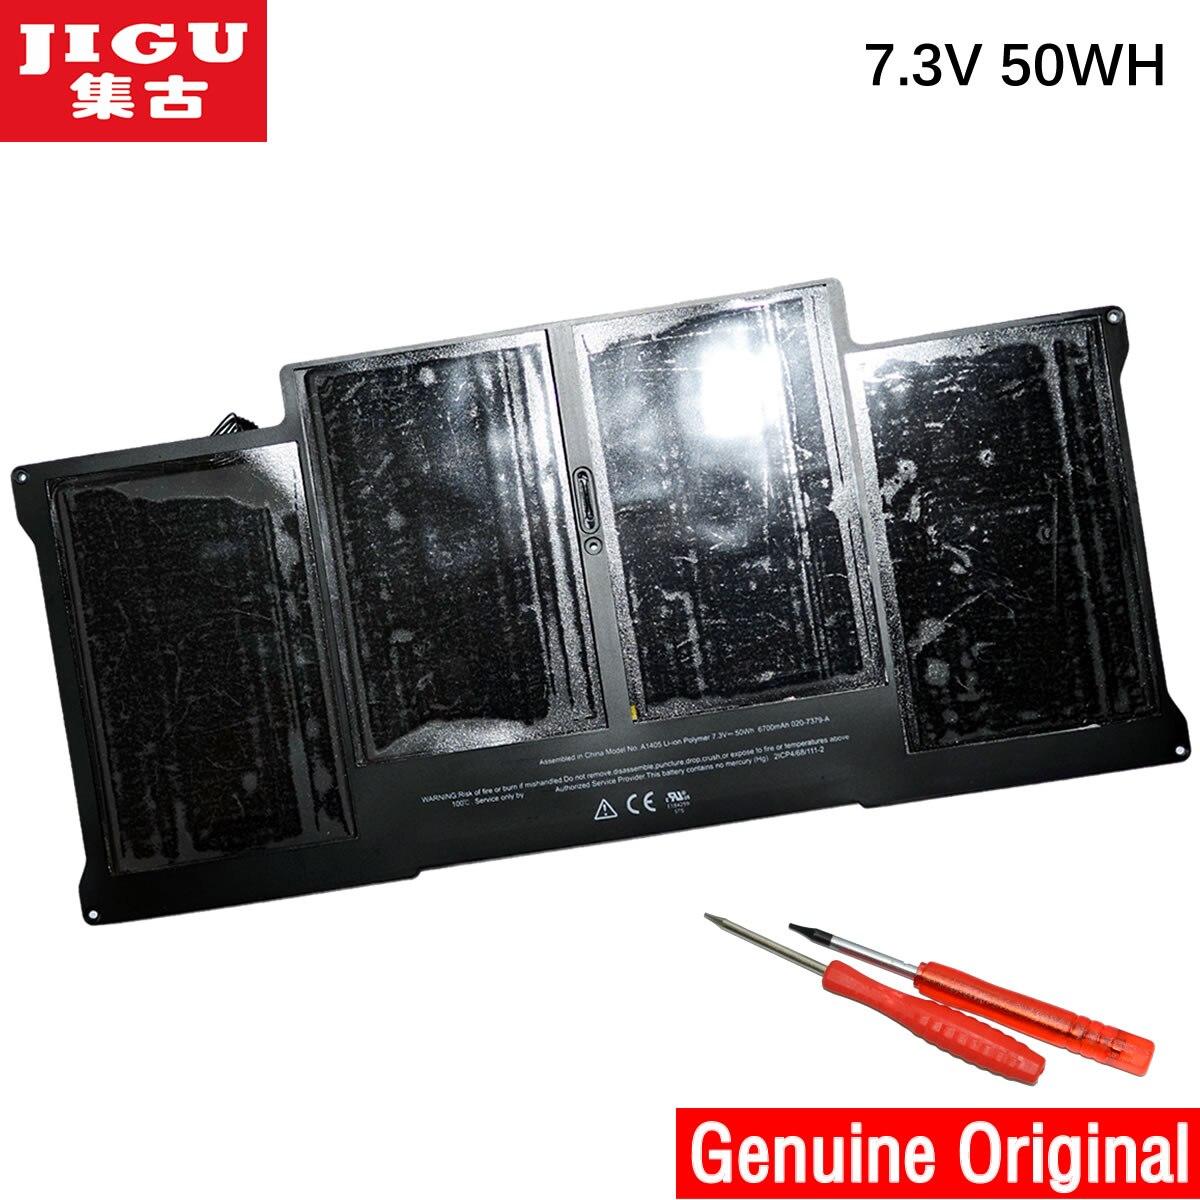 "JIGU batería Original genuina A1405 para MacBook Air 13 ""A1369 Mid 2011 A1466 Mid 2012"